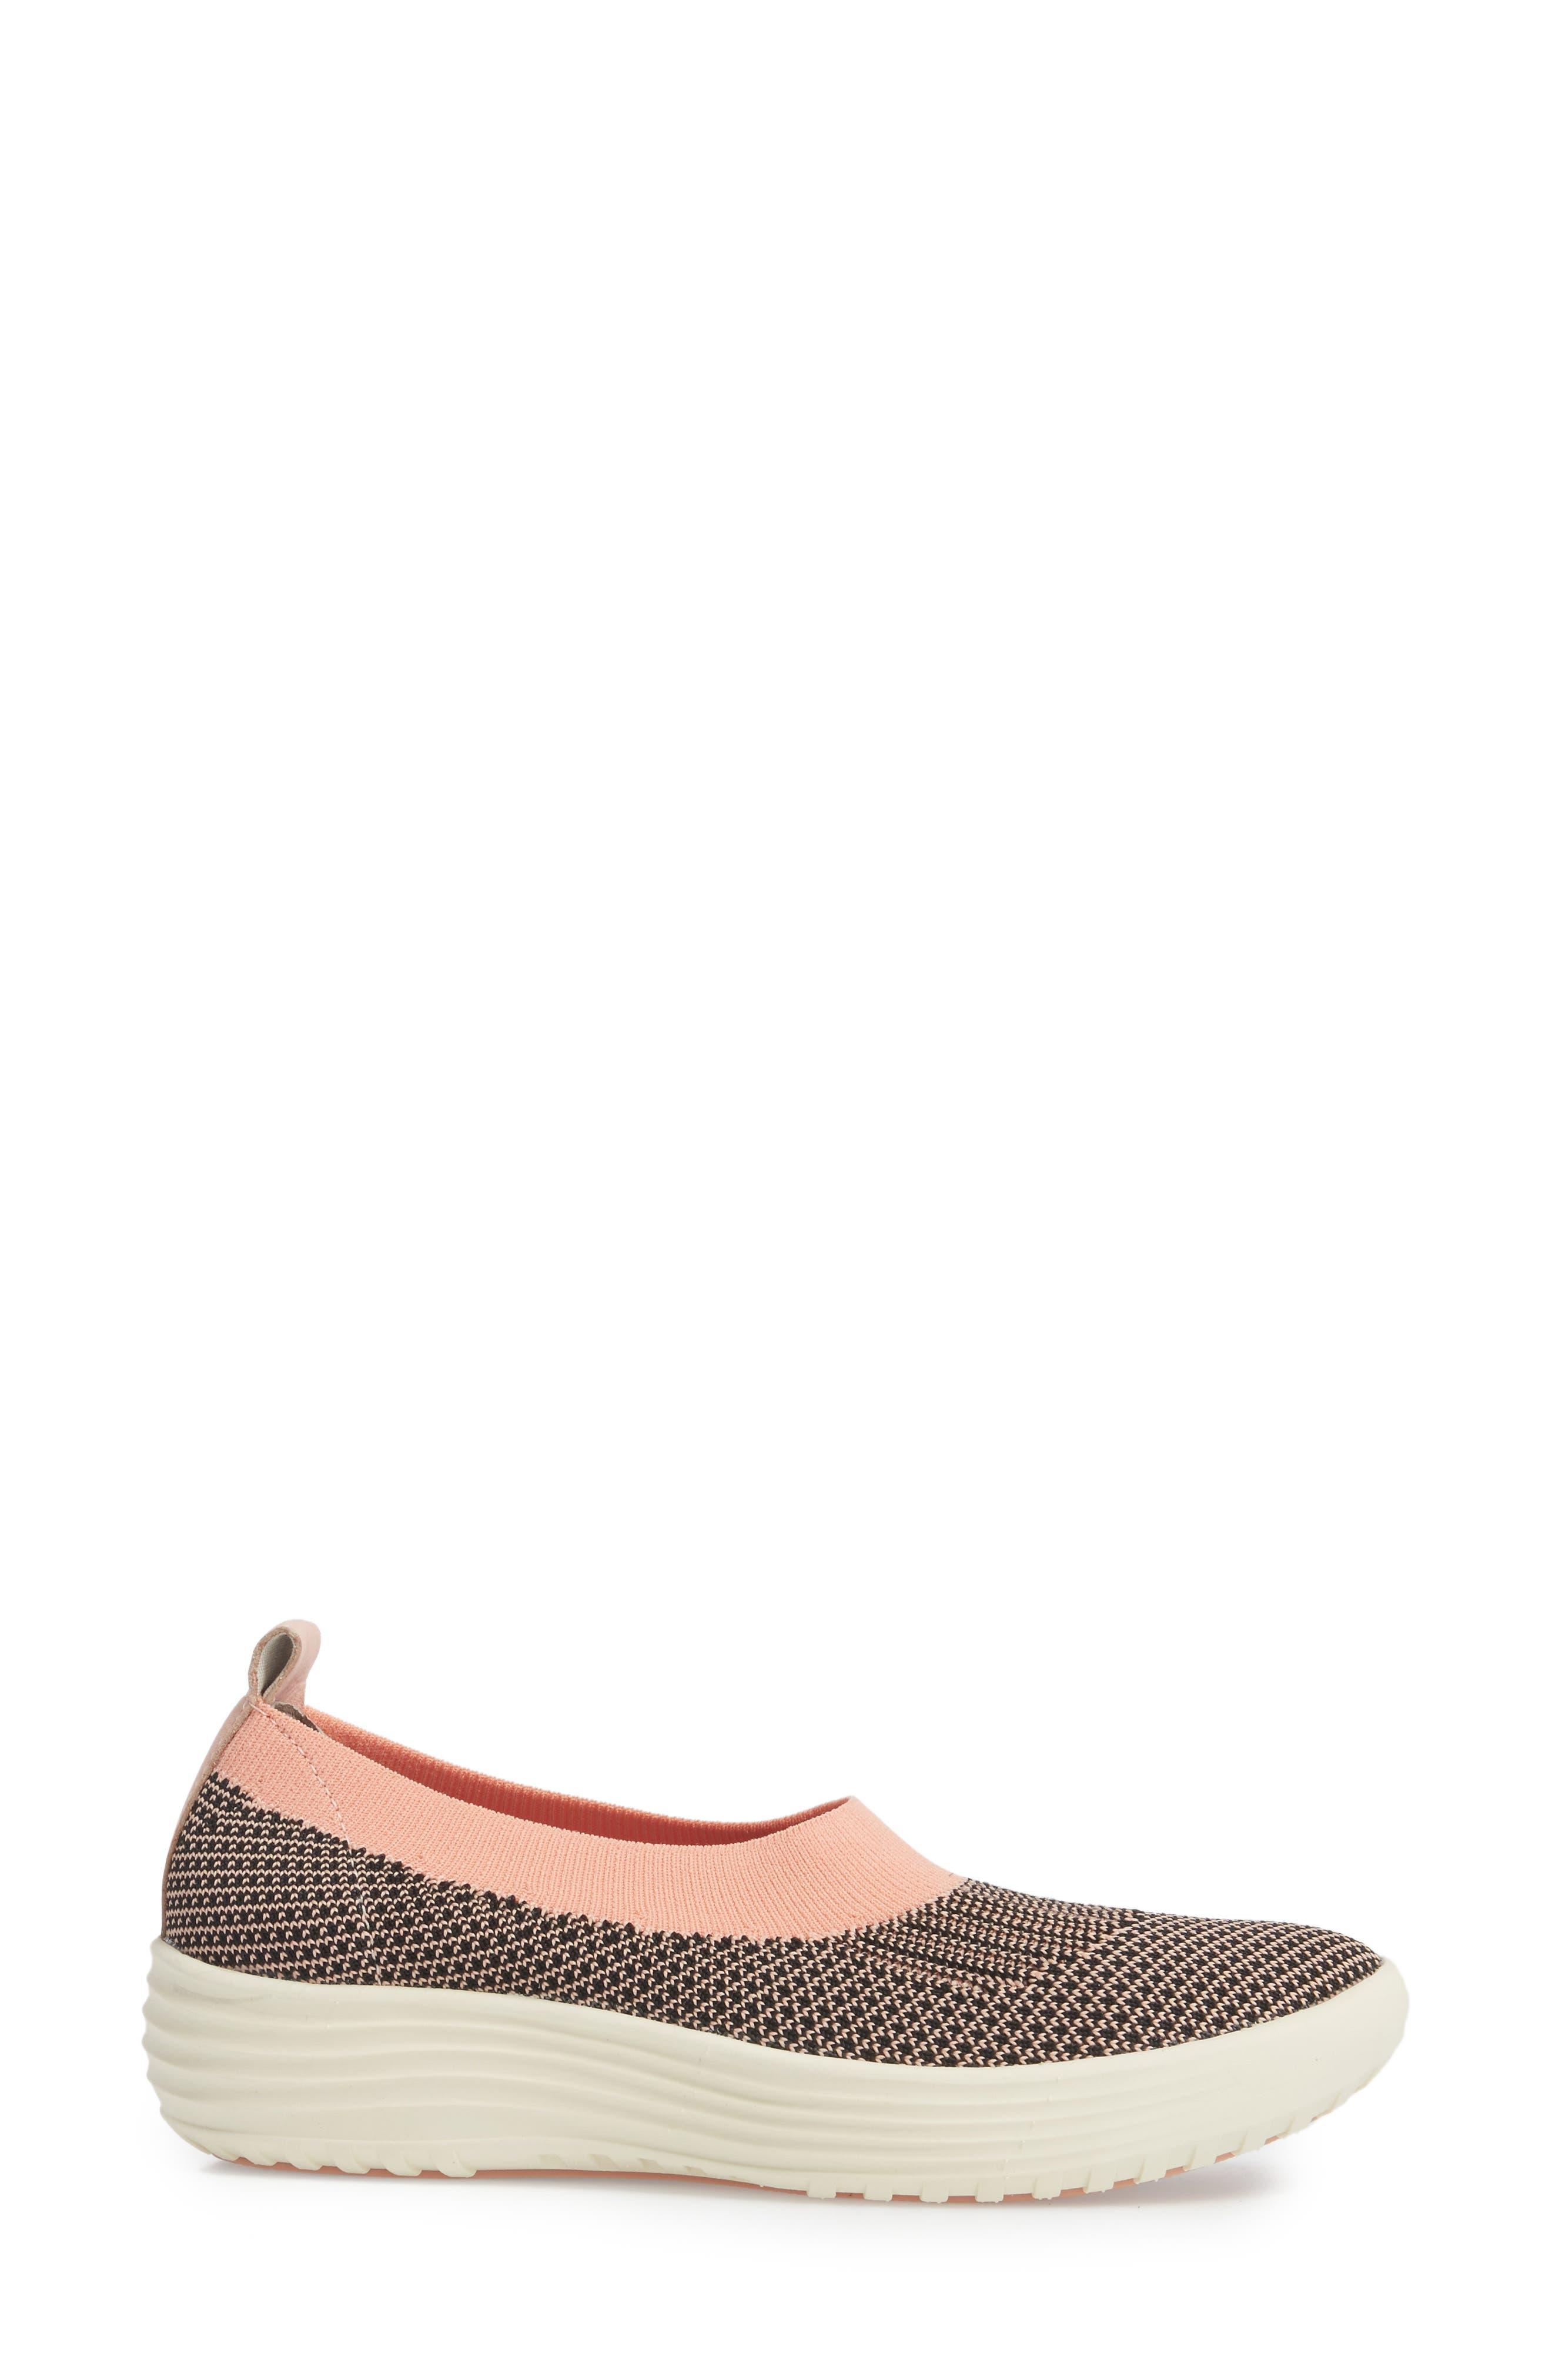 Merigold Slip-On Sock Fit Sneaker,                             Alternate thumbnail 3, color,                             Pink/ Black Knit Fabric